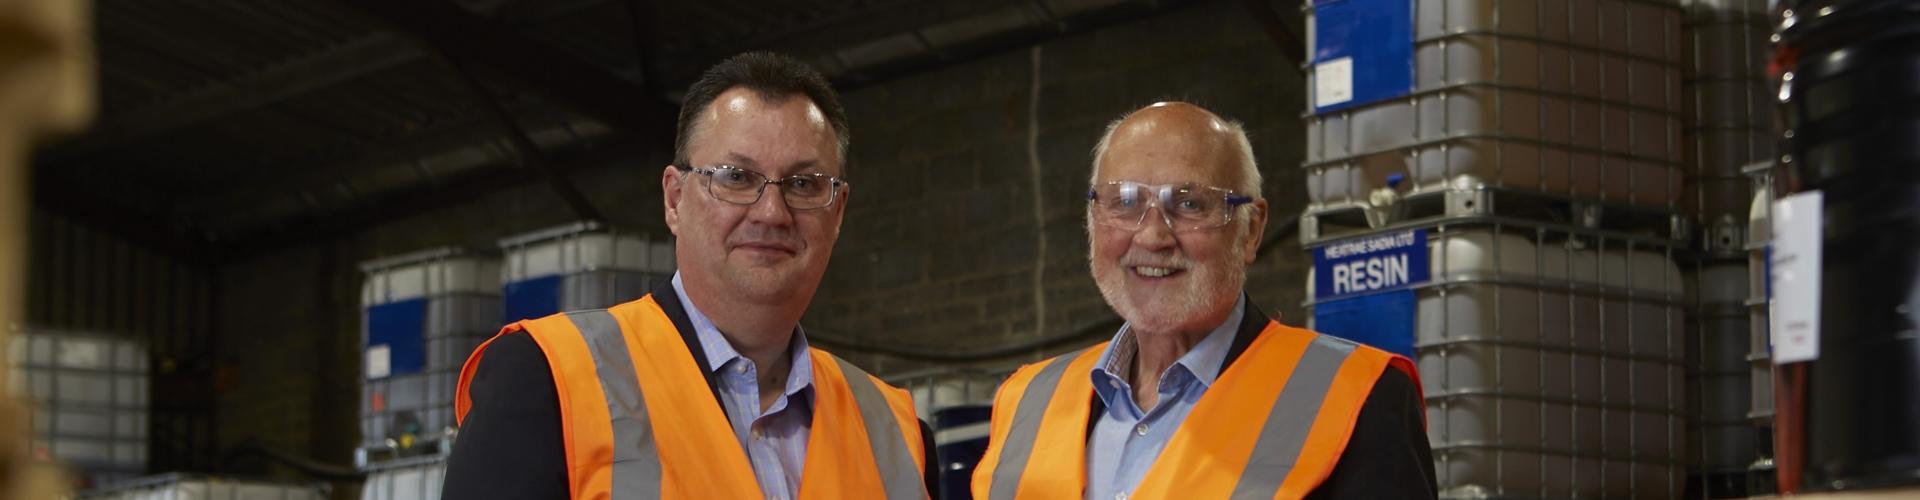 IFS Huntsman: Iain Stanton & Barrie Colvin